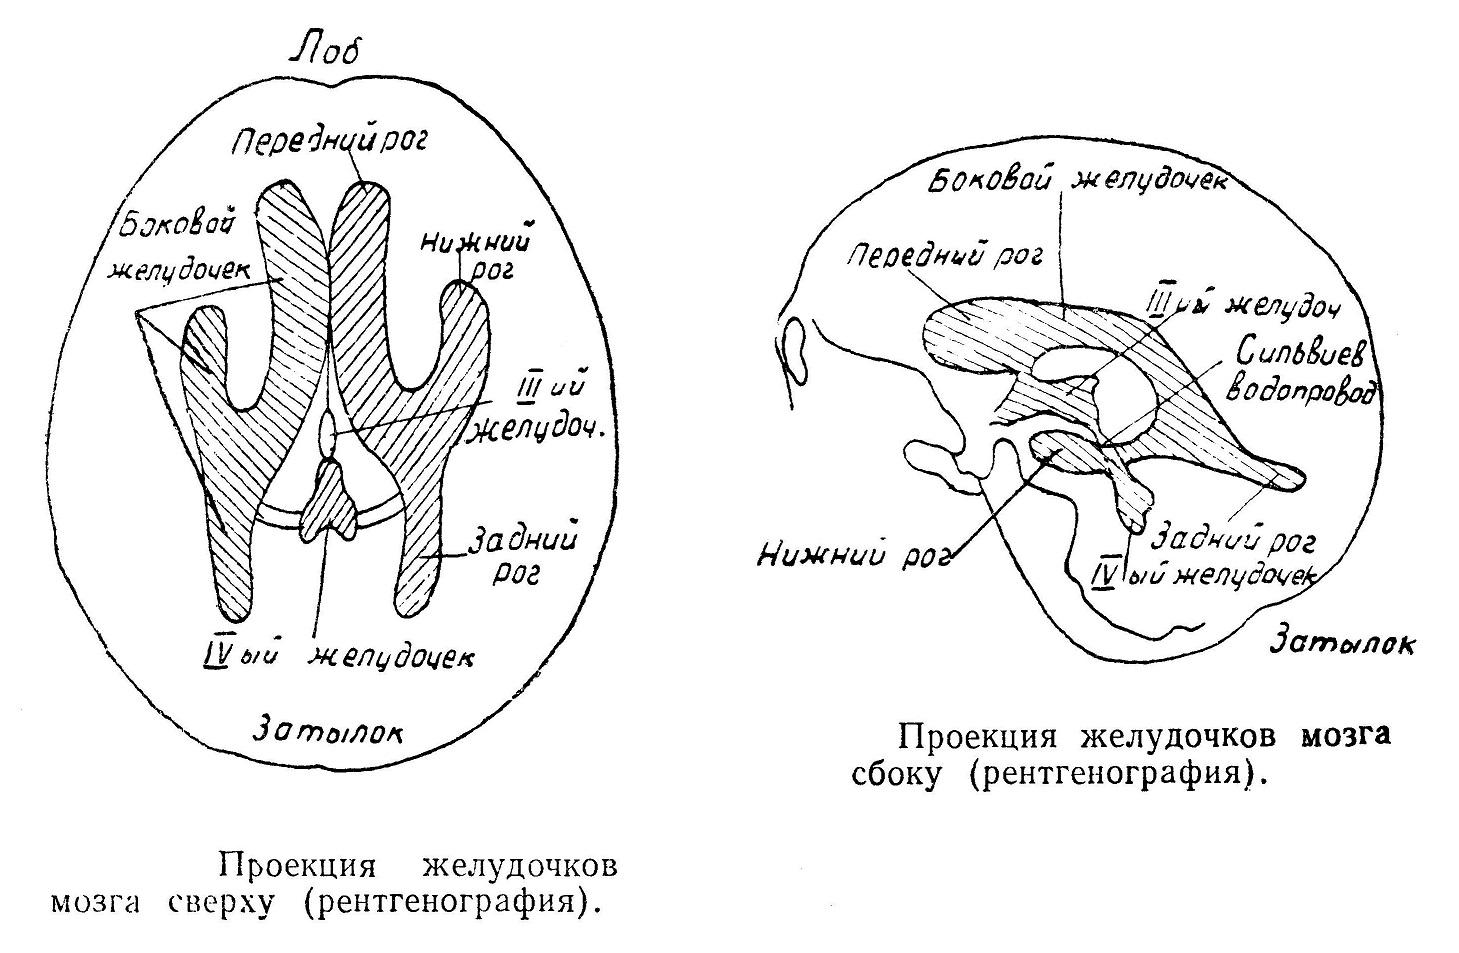 Проекция желудочков мозга рентгенография